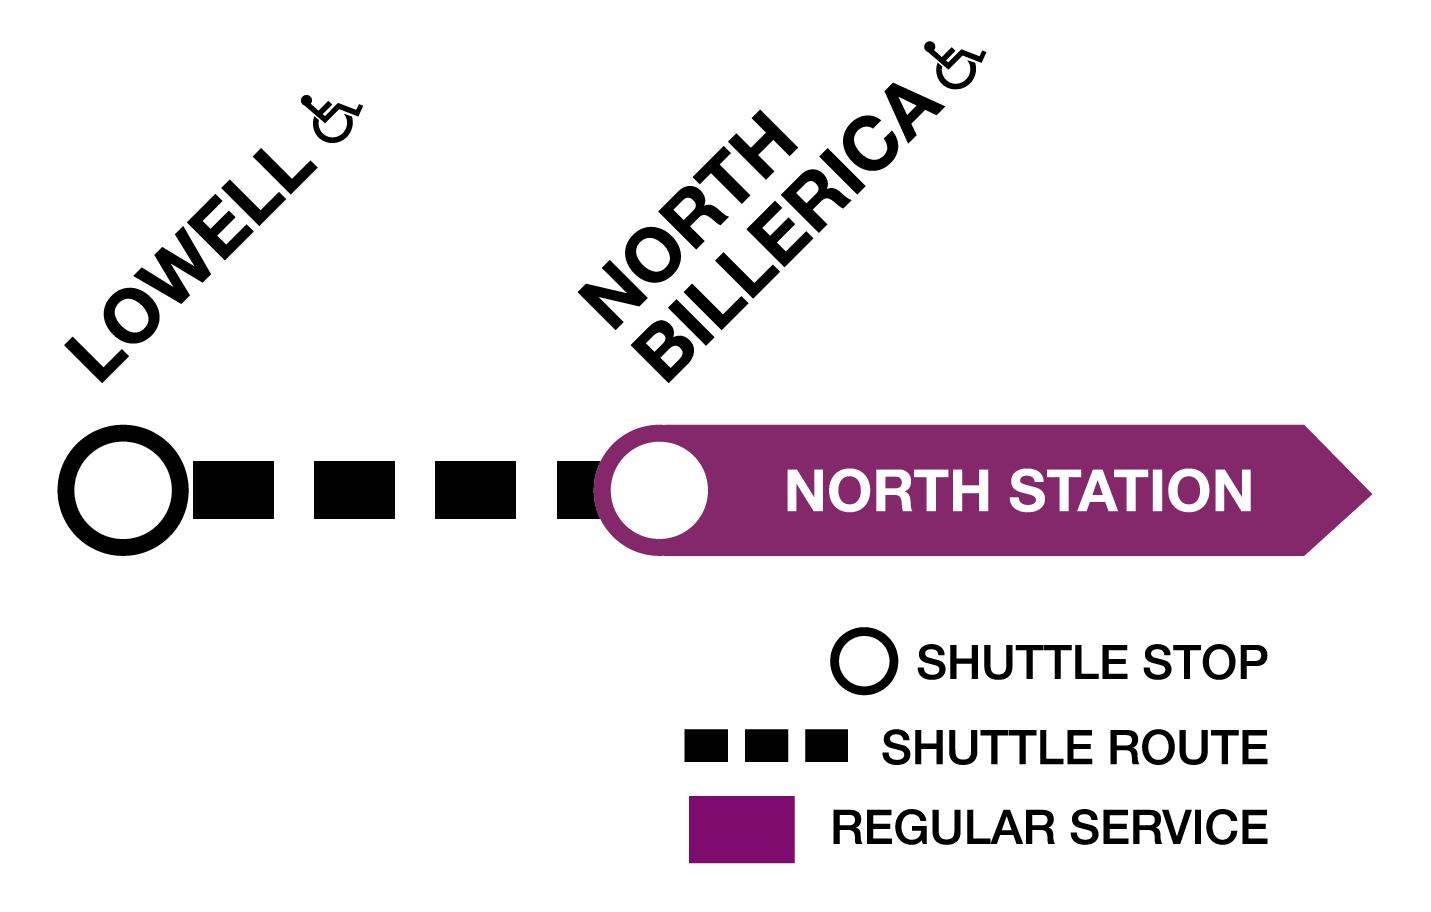 Shuttles run betwen Lowell and North Billerica